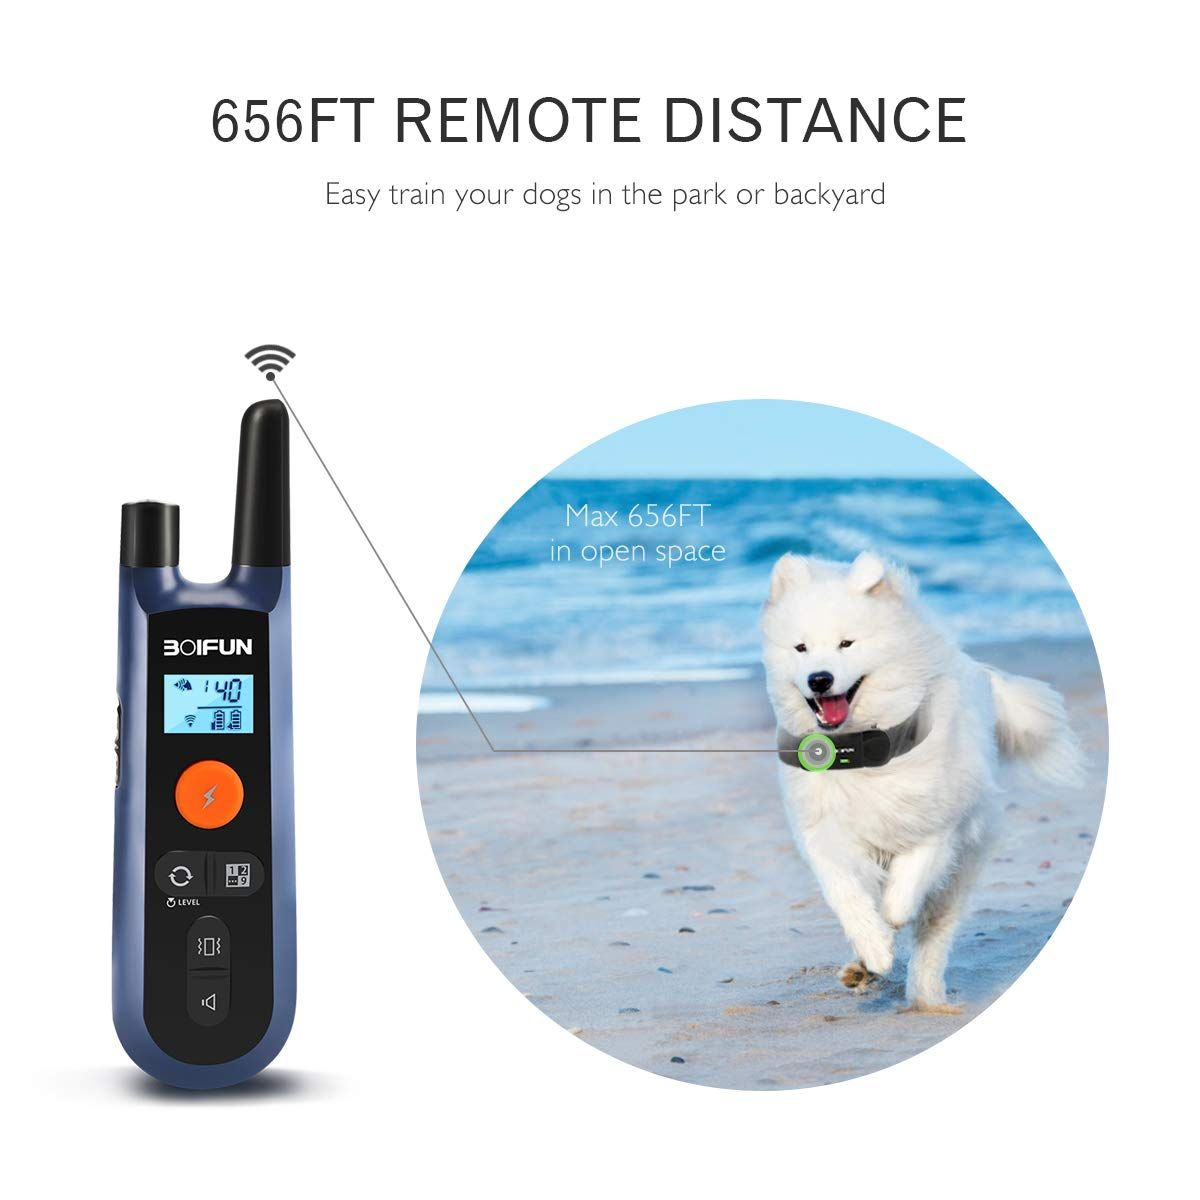 Boifun Dog Training Collar Waterproof And Rechargeable Dog Shock